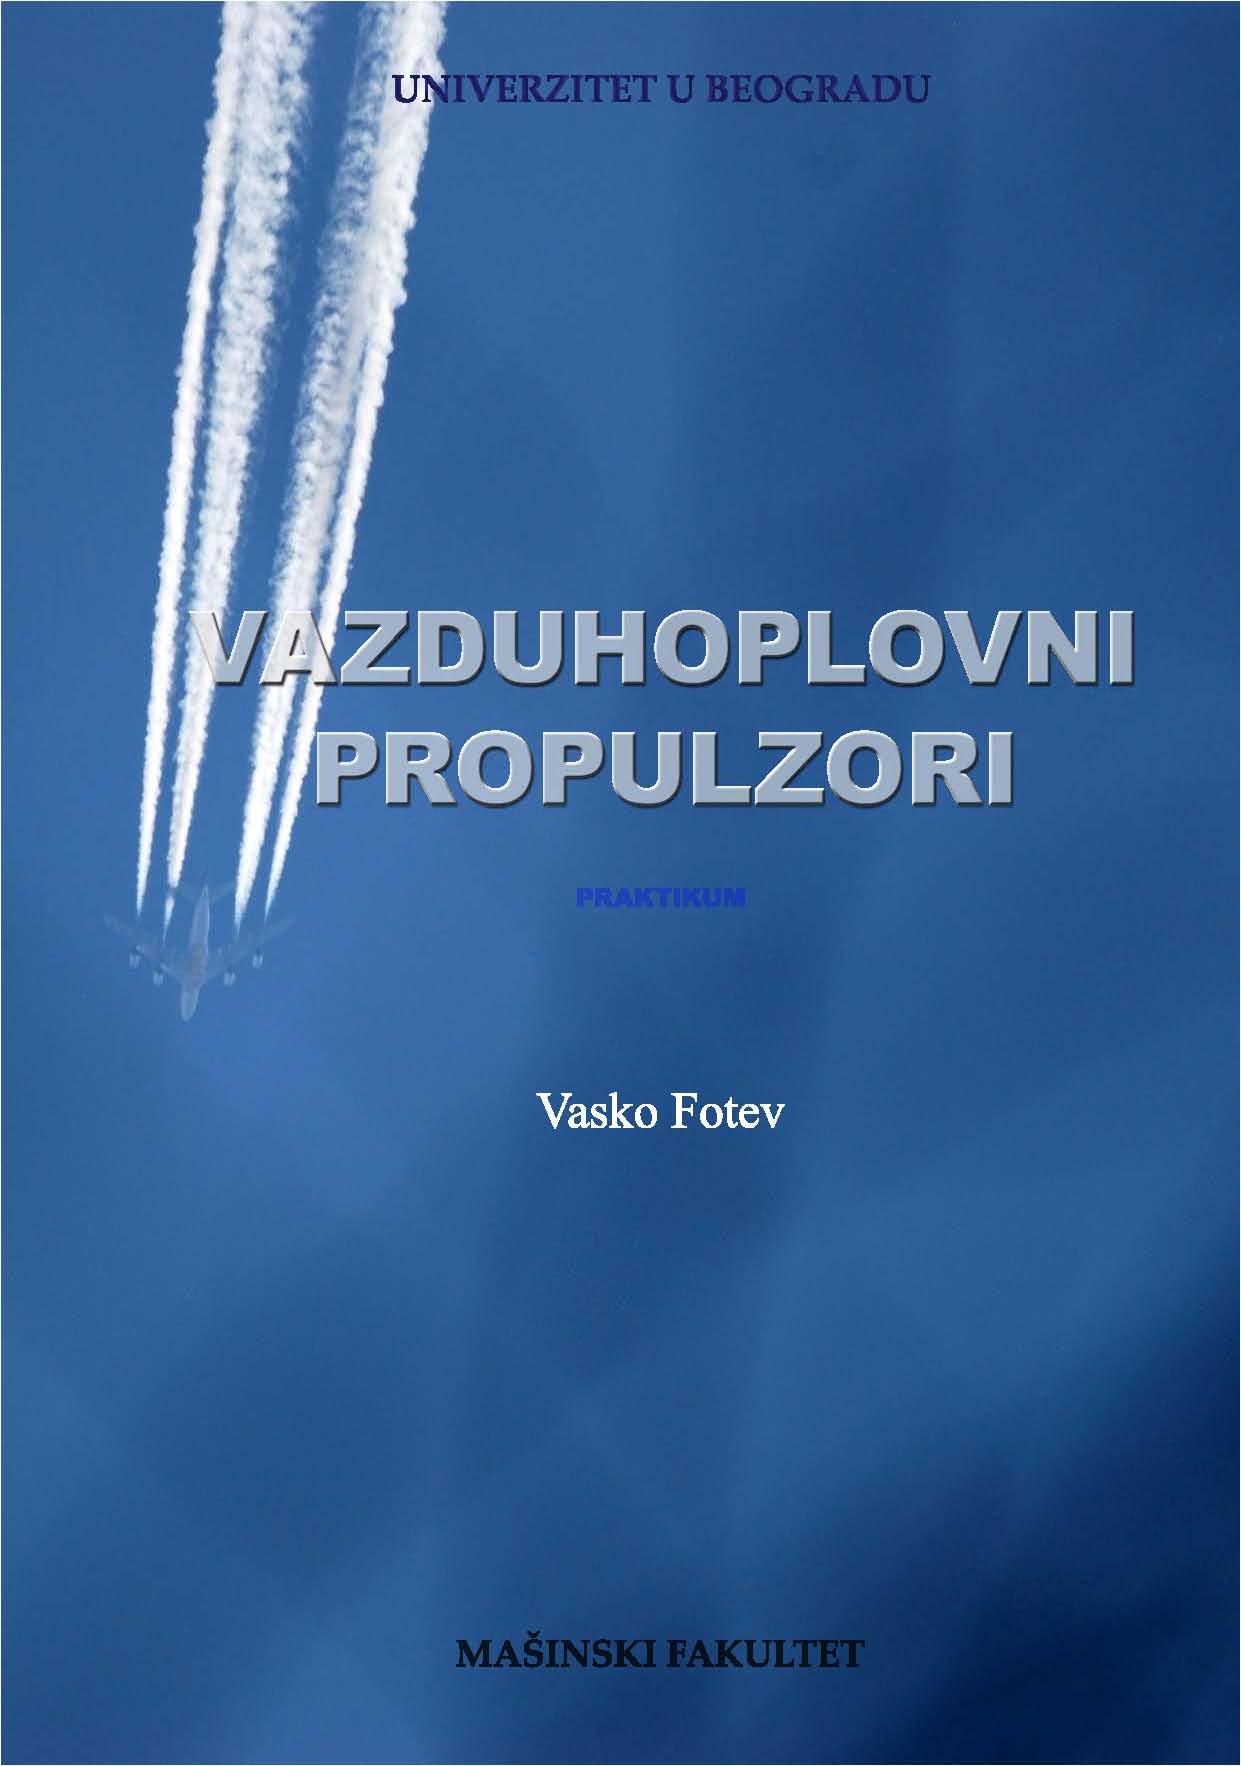 Vazduhoplovni propulzori: praktikum